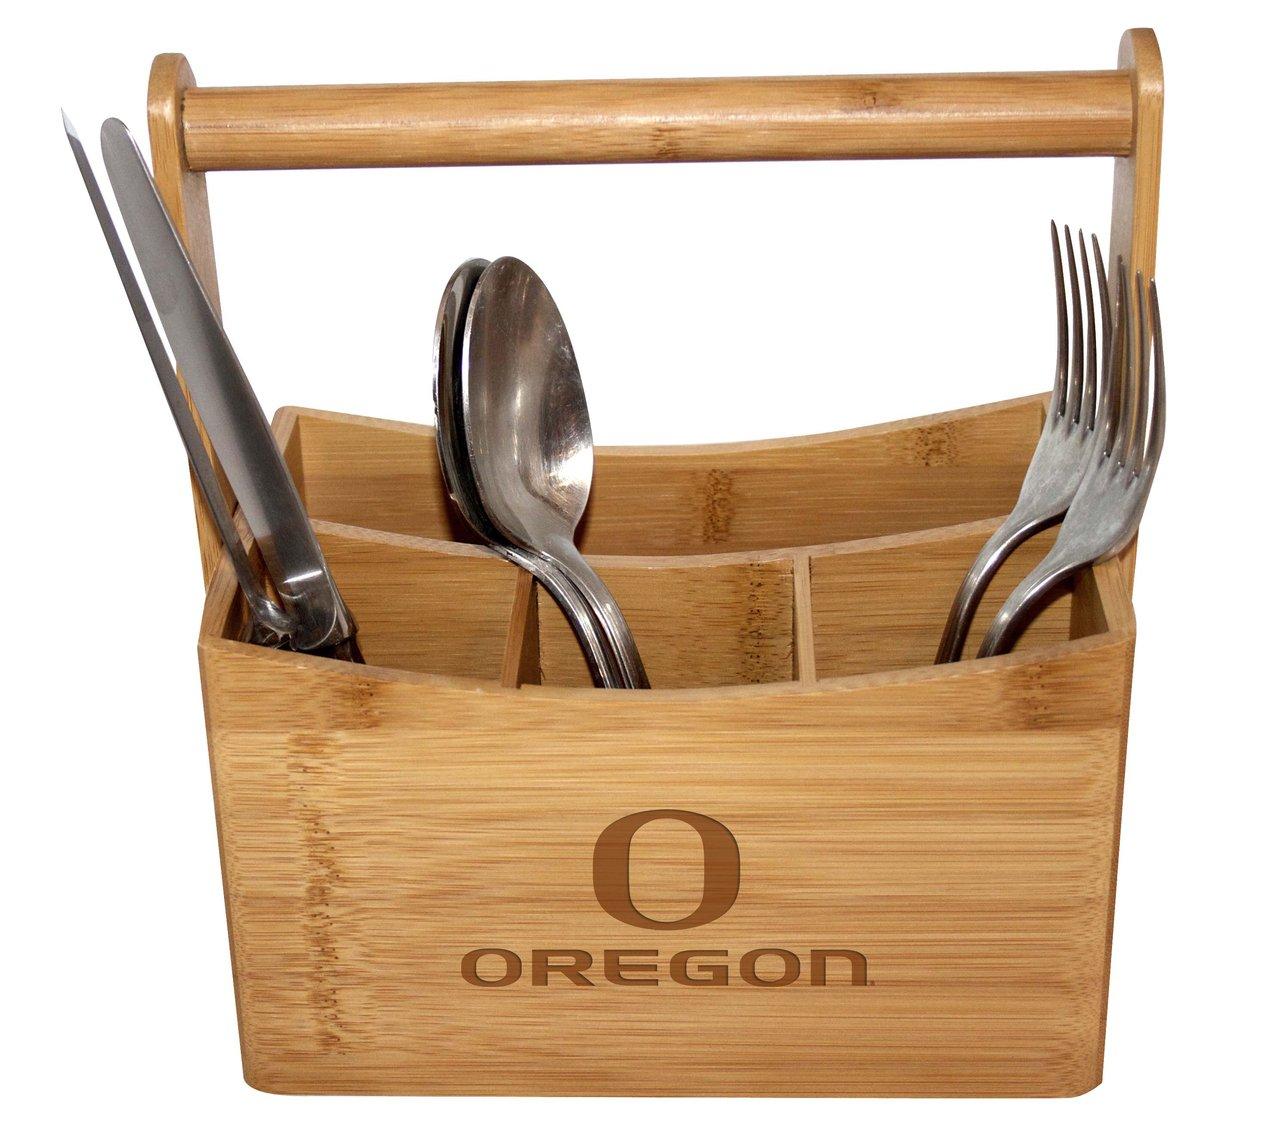 Oregon Bamboo Caddy